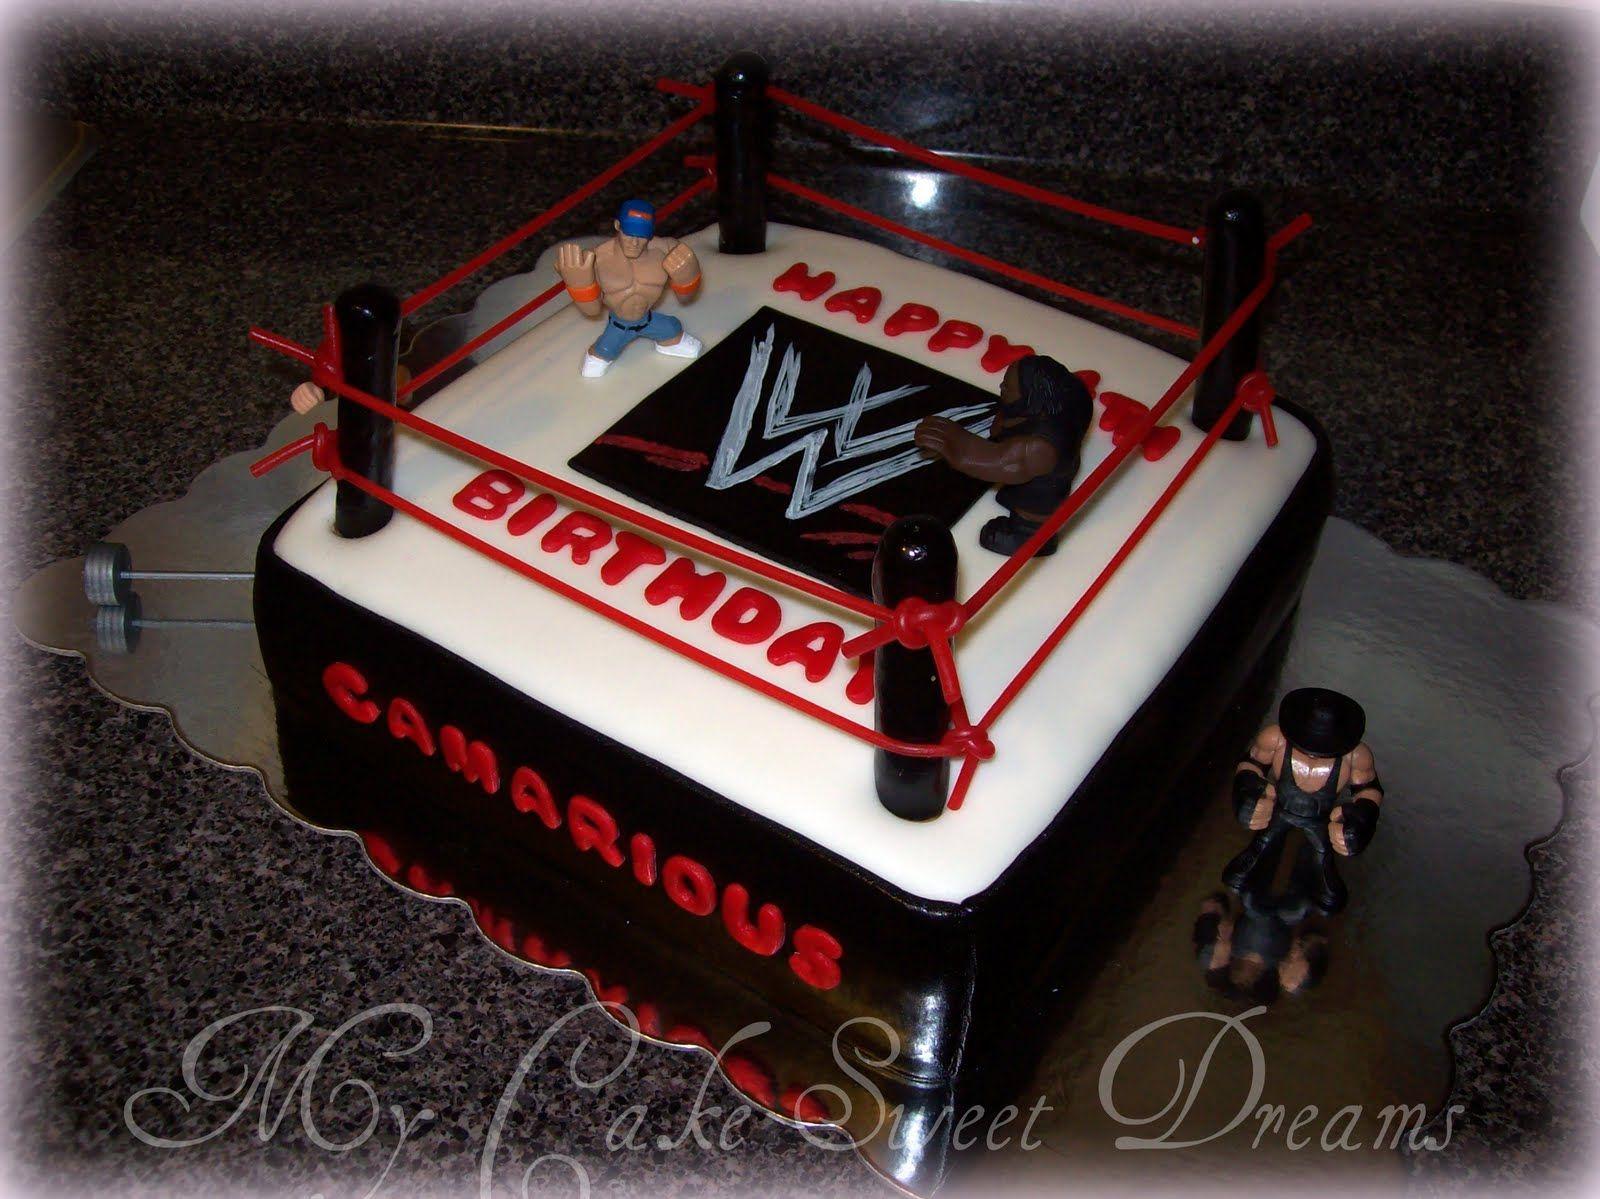 wwf cake My Cake Sweet Dreams WWE Wrestling Cake Pretty